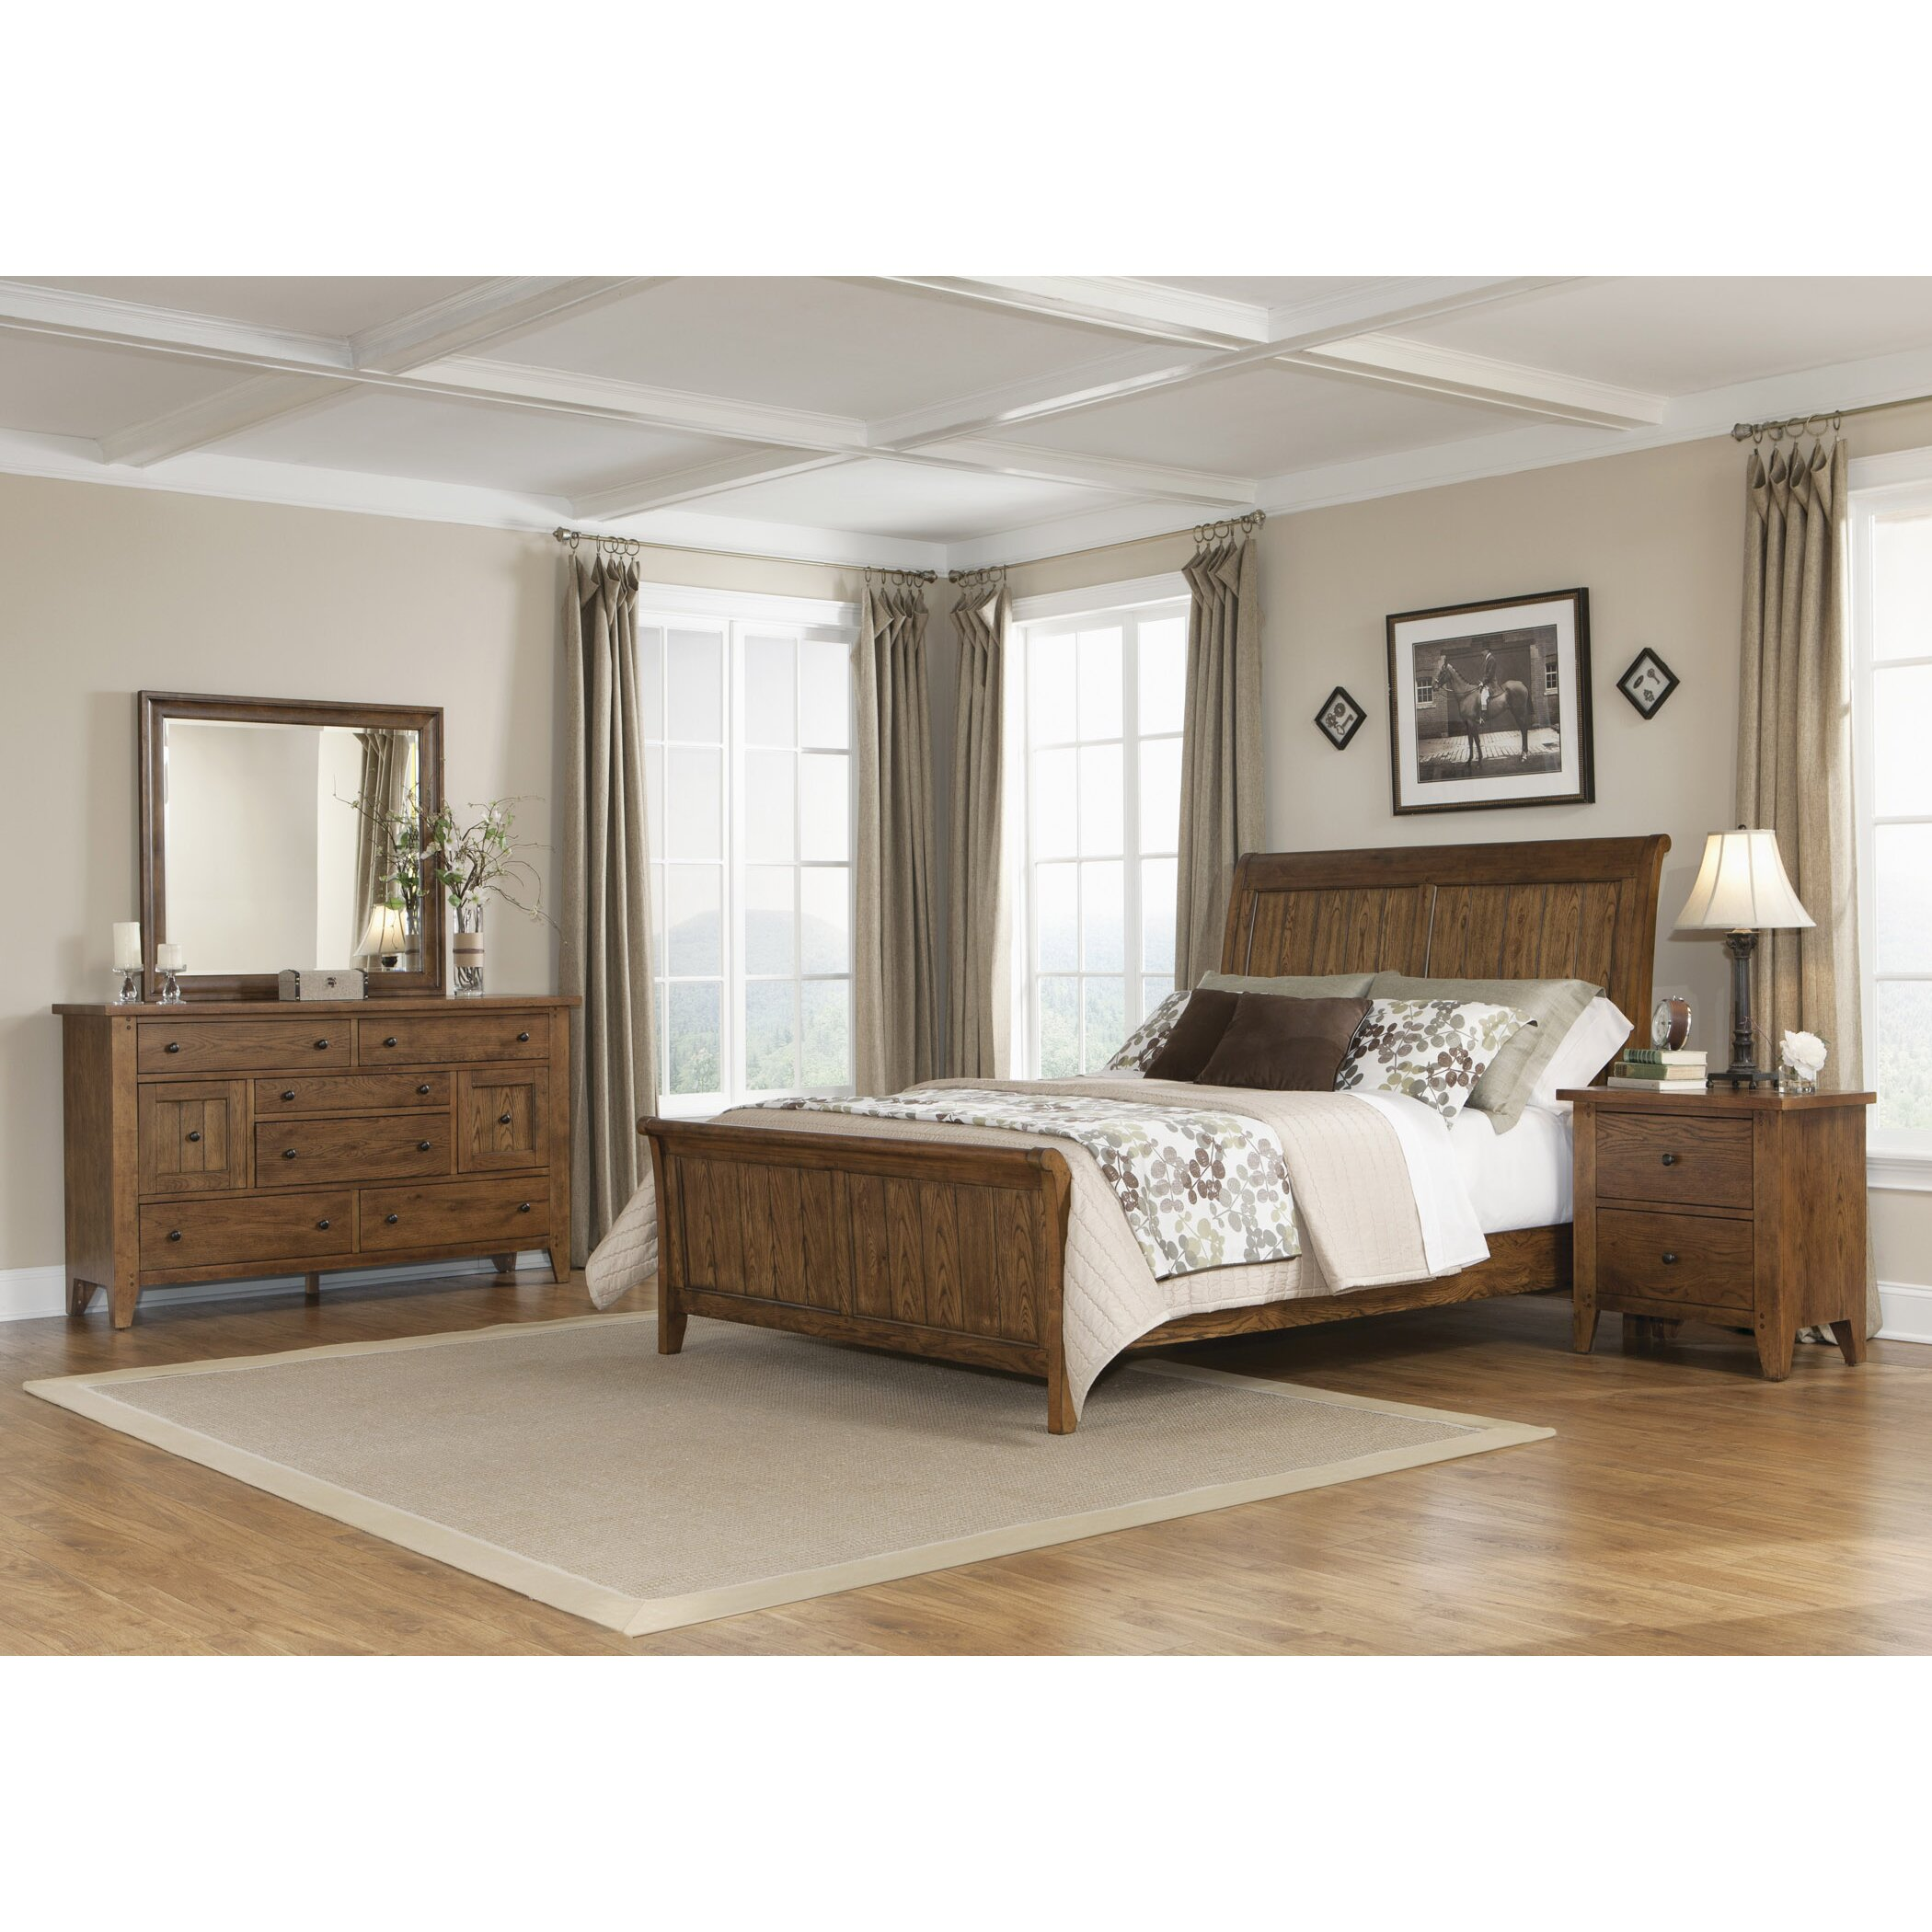 Hearthstone Bedroom Furniture